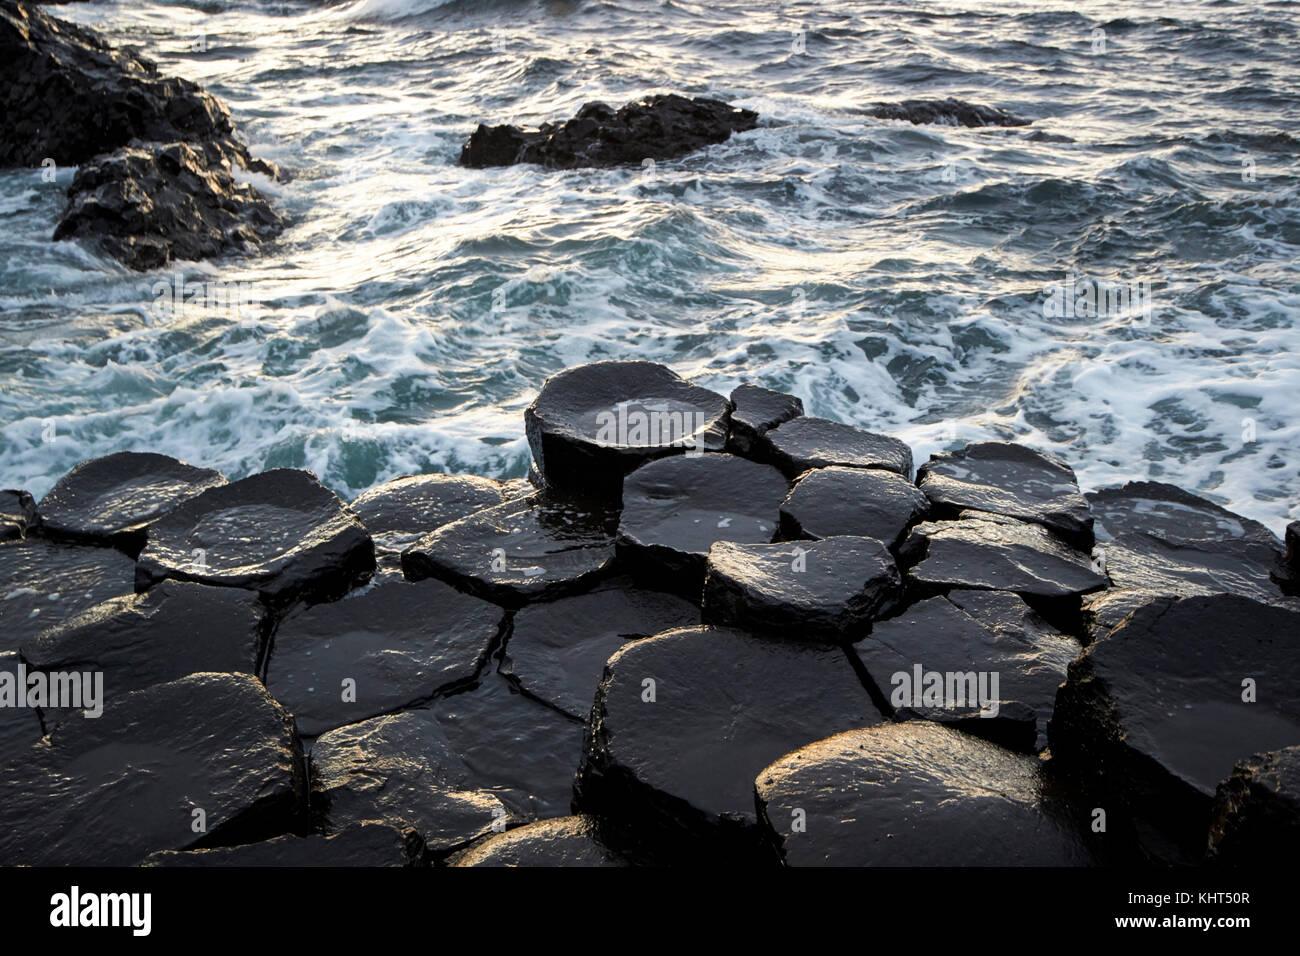 hexagonal rocks at the Giants Causeway county antrim northern ireland uk - Stock Image